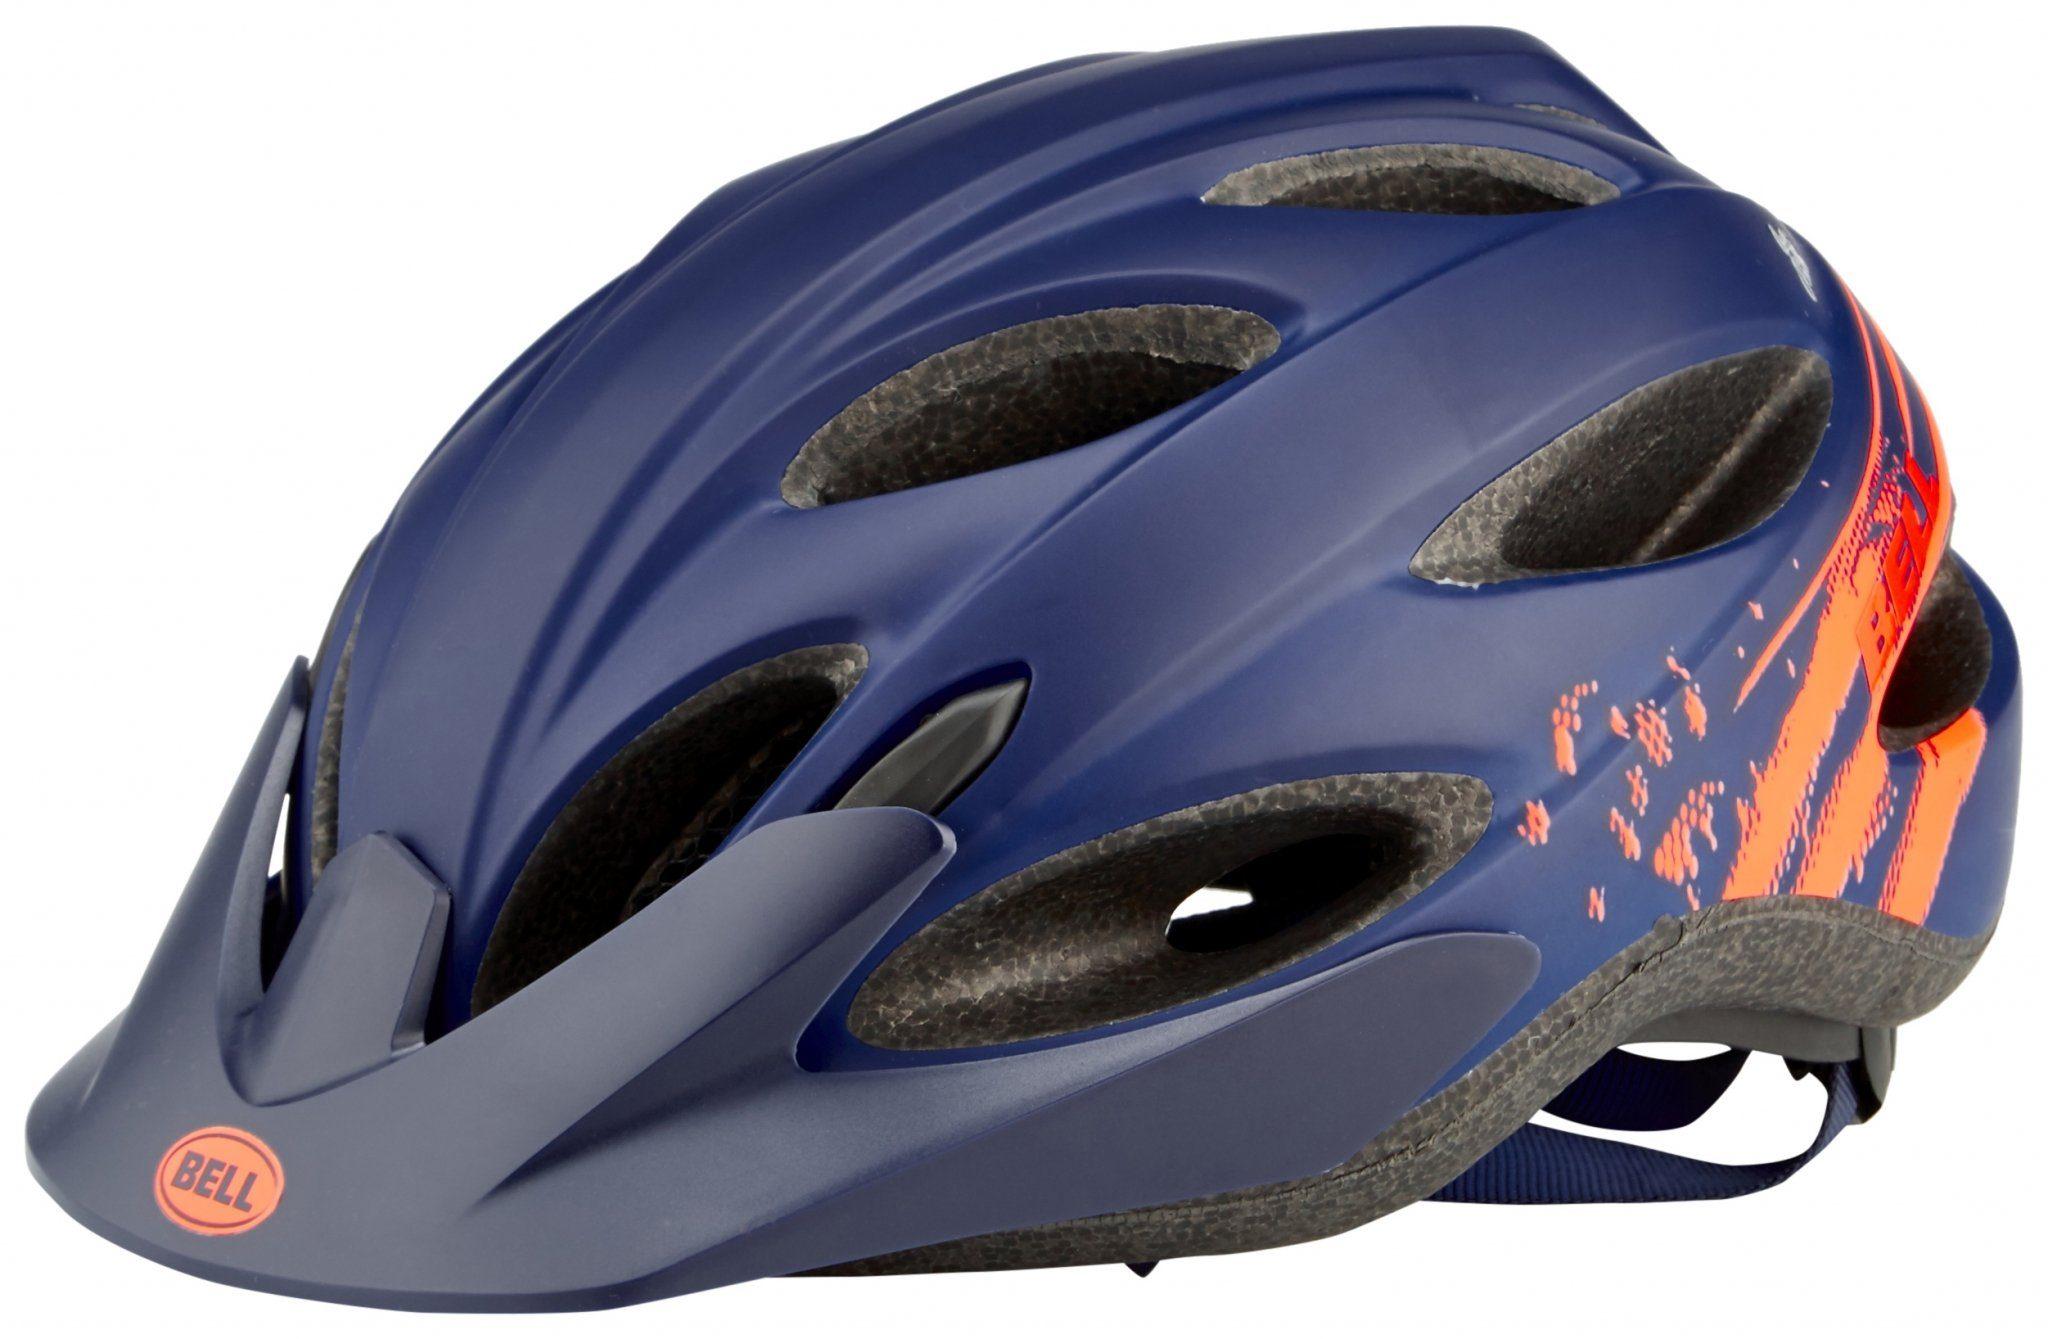 Bell Fahrradhelm »Strut Helmet Women unisize«